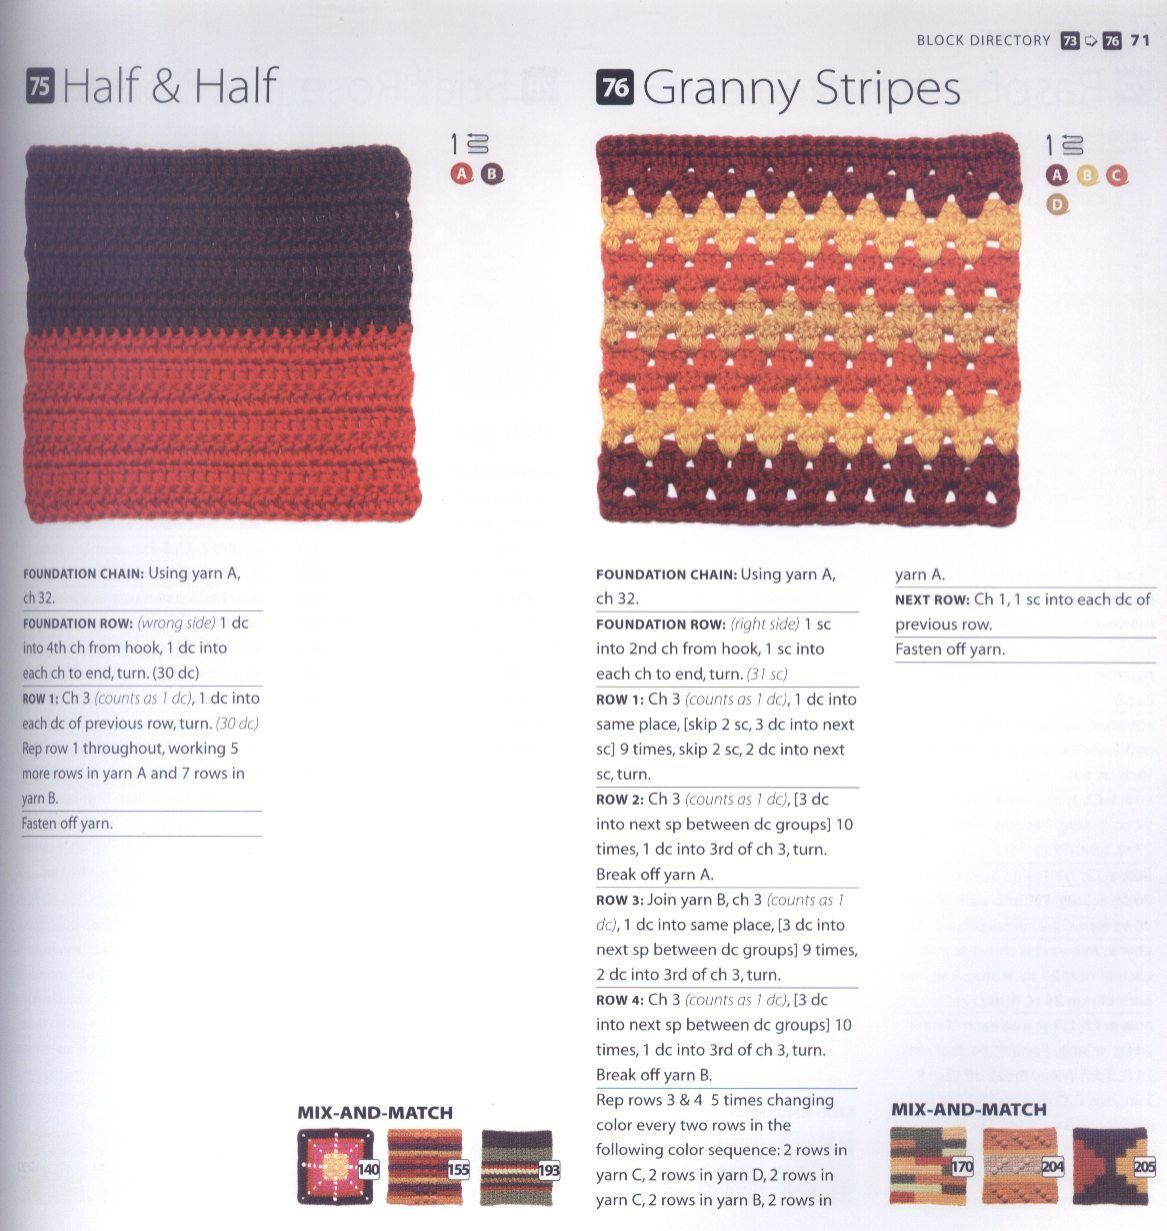 200 Crocheted Blocks for blankets, throws & Afghans 071